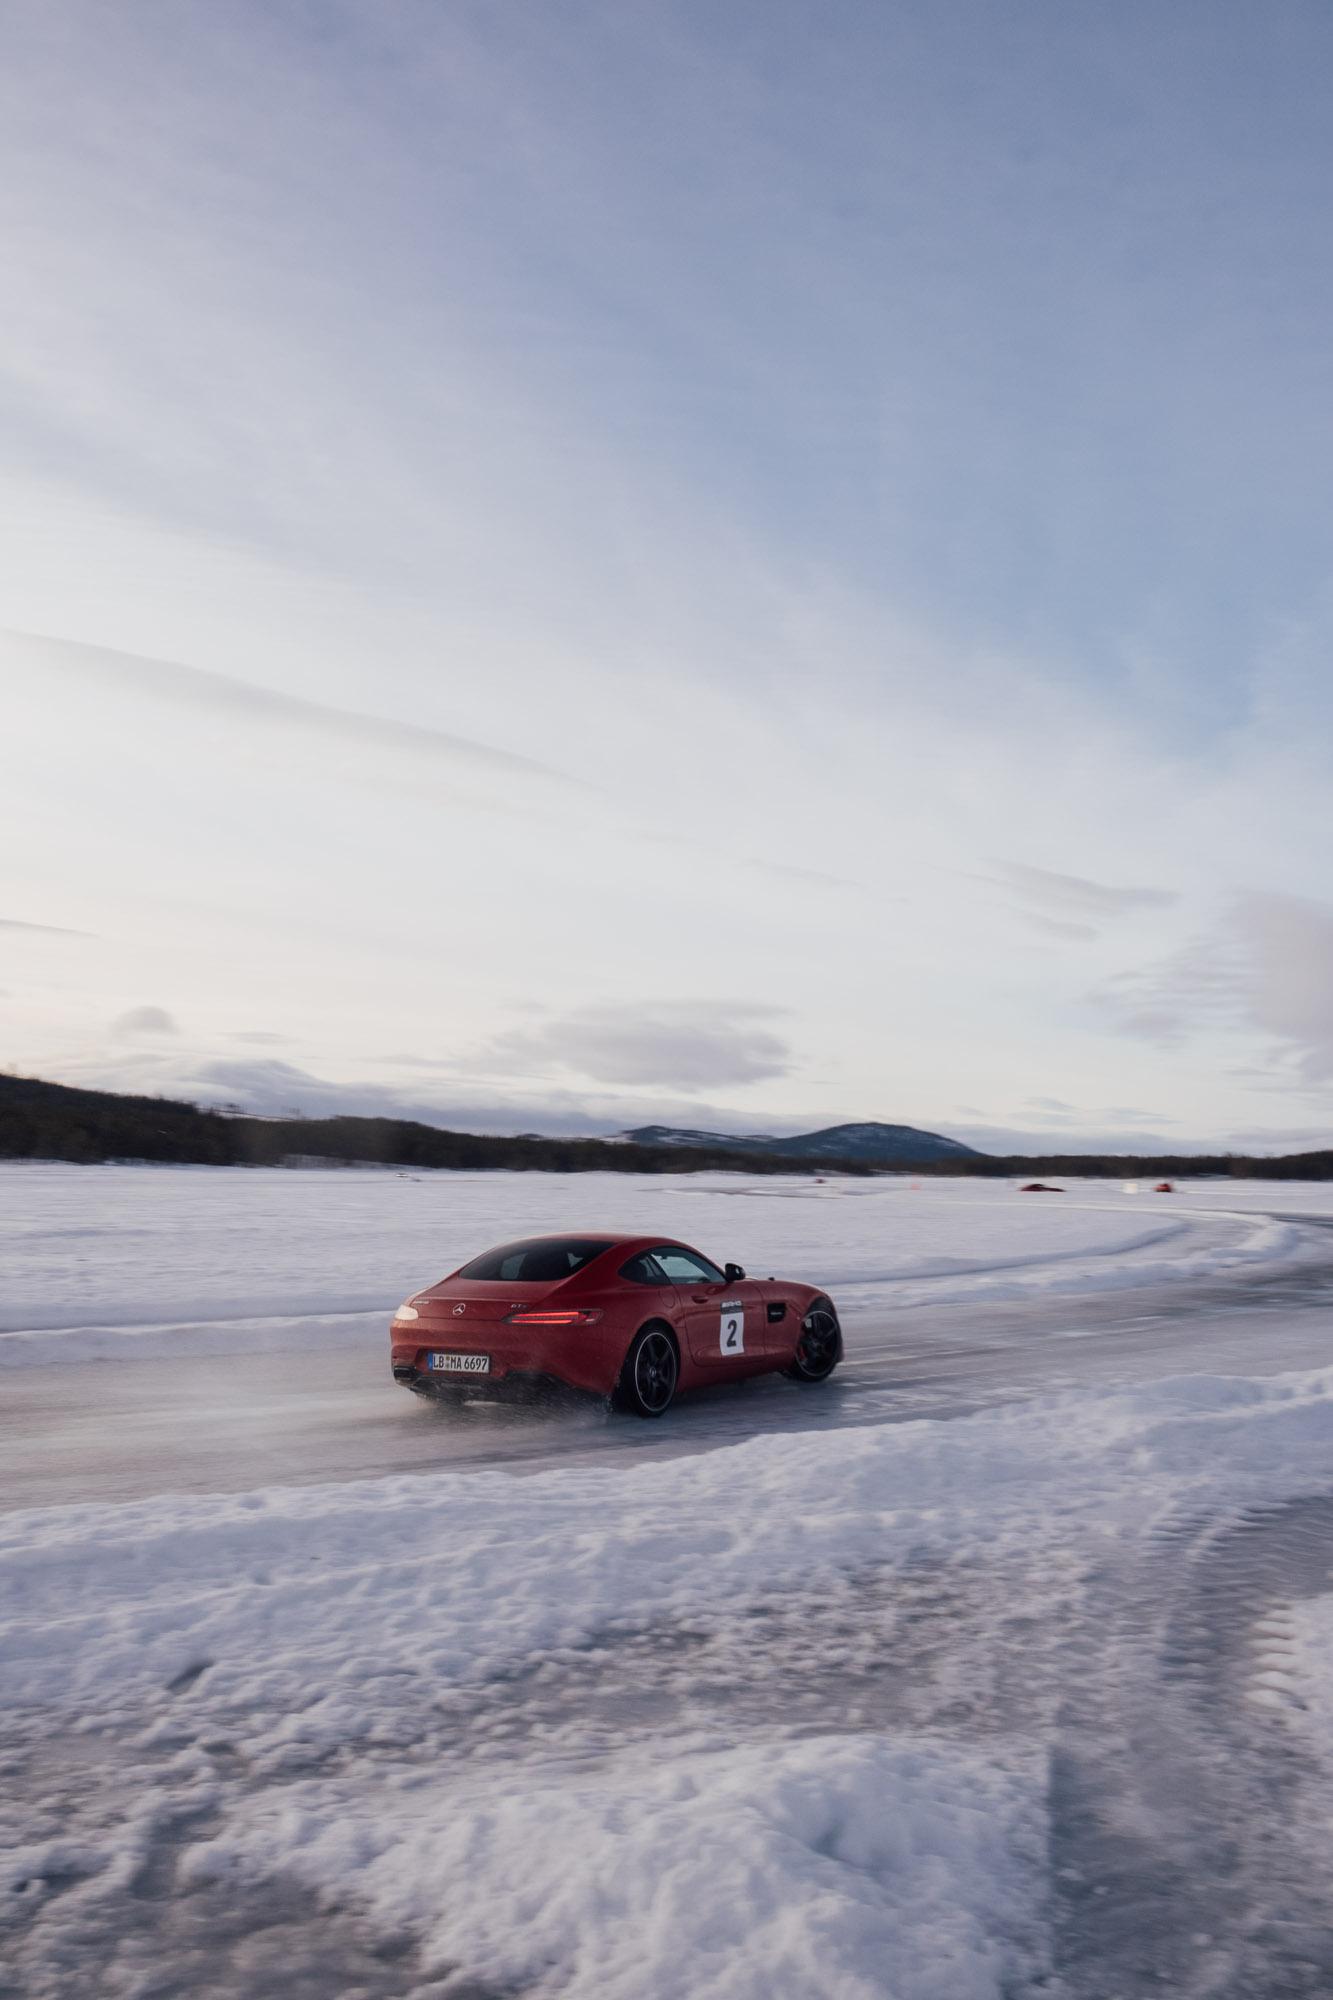 Drive_for_Good_Ice_Drive_by_Maxim_Kuijper-0157.jpg